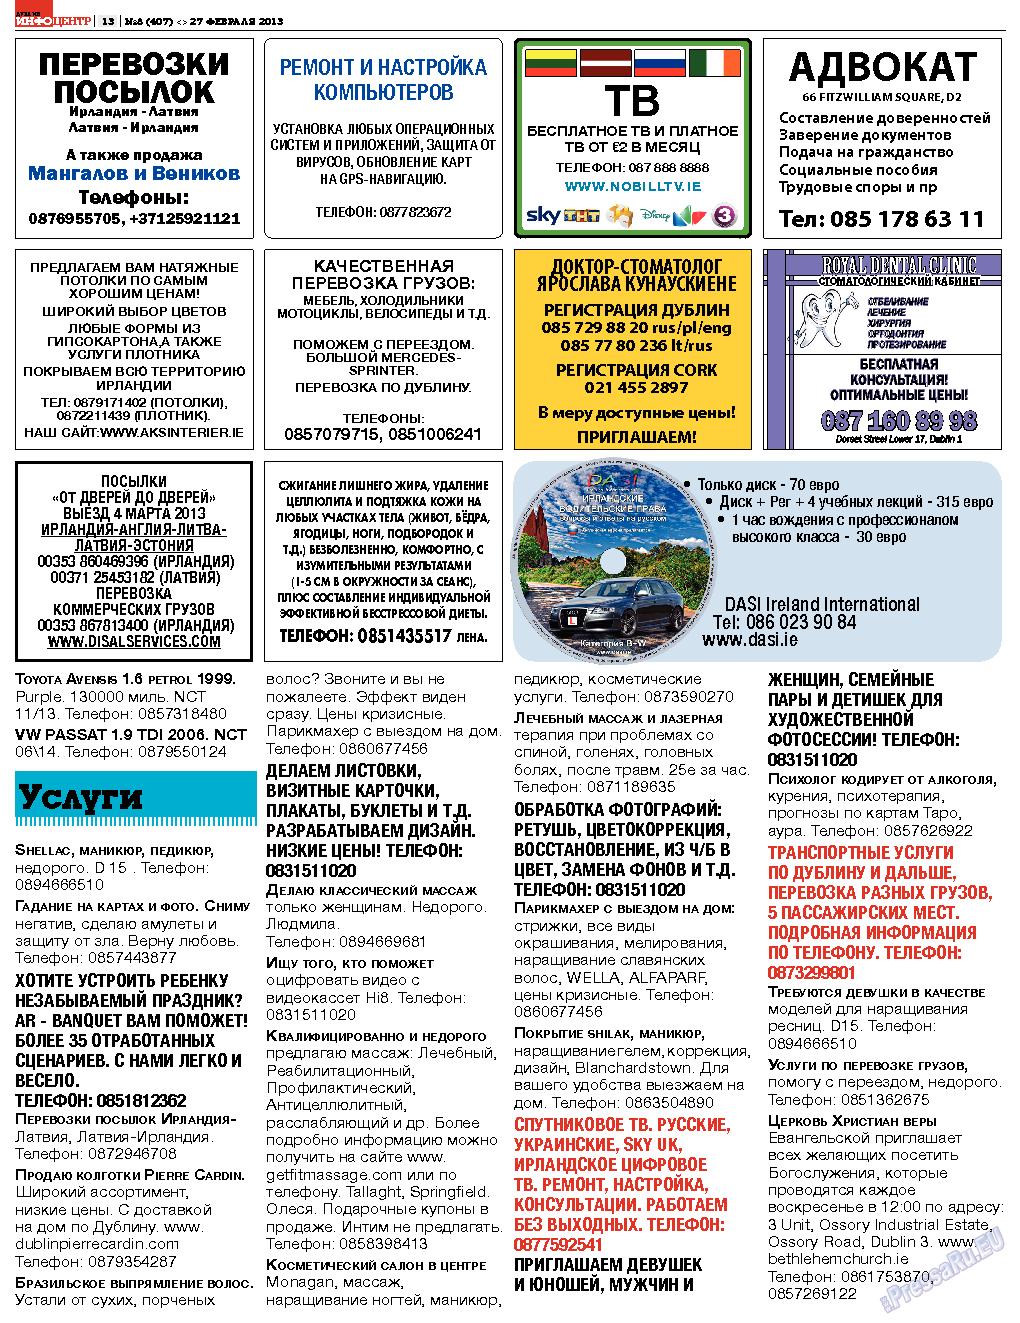 Дублин инфоцентр (газета). 2013 год, номер 8, стр. 13